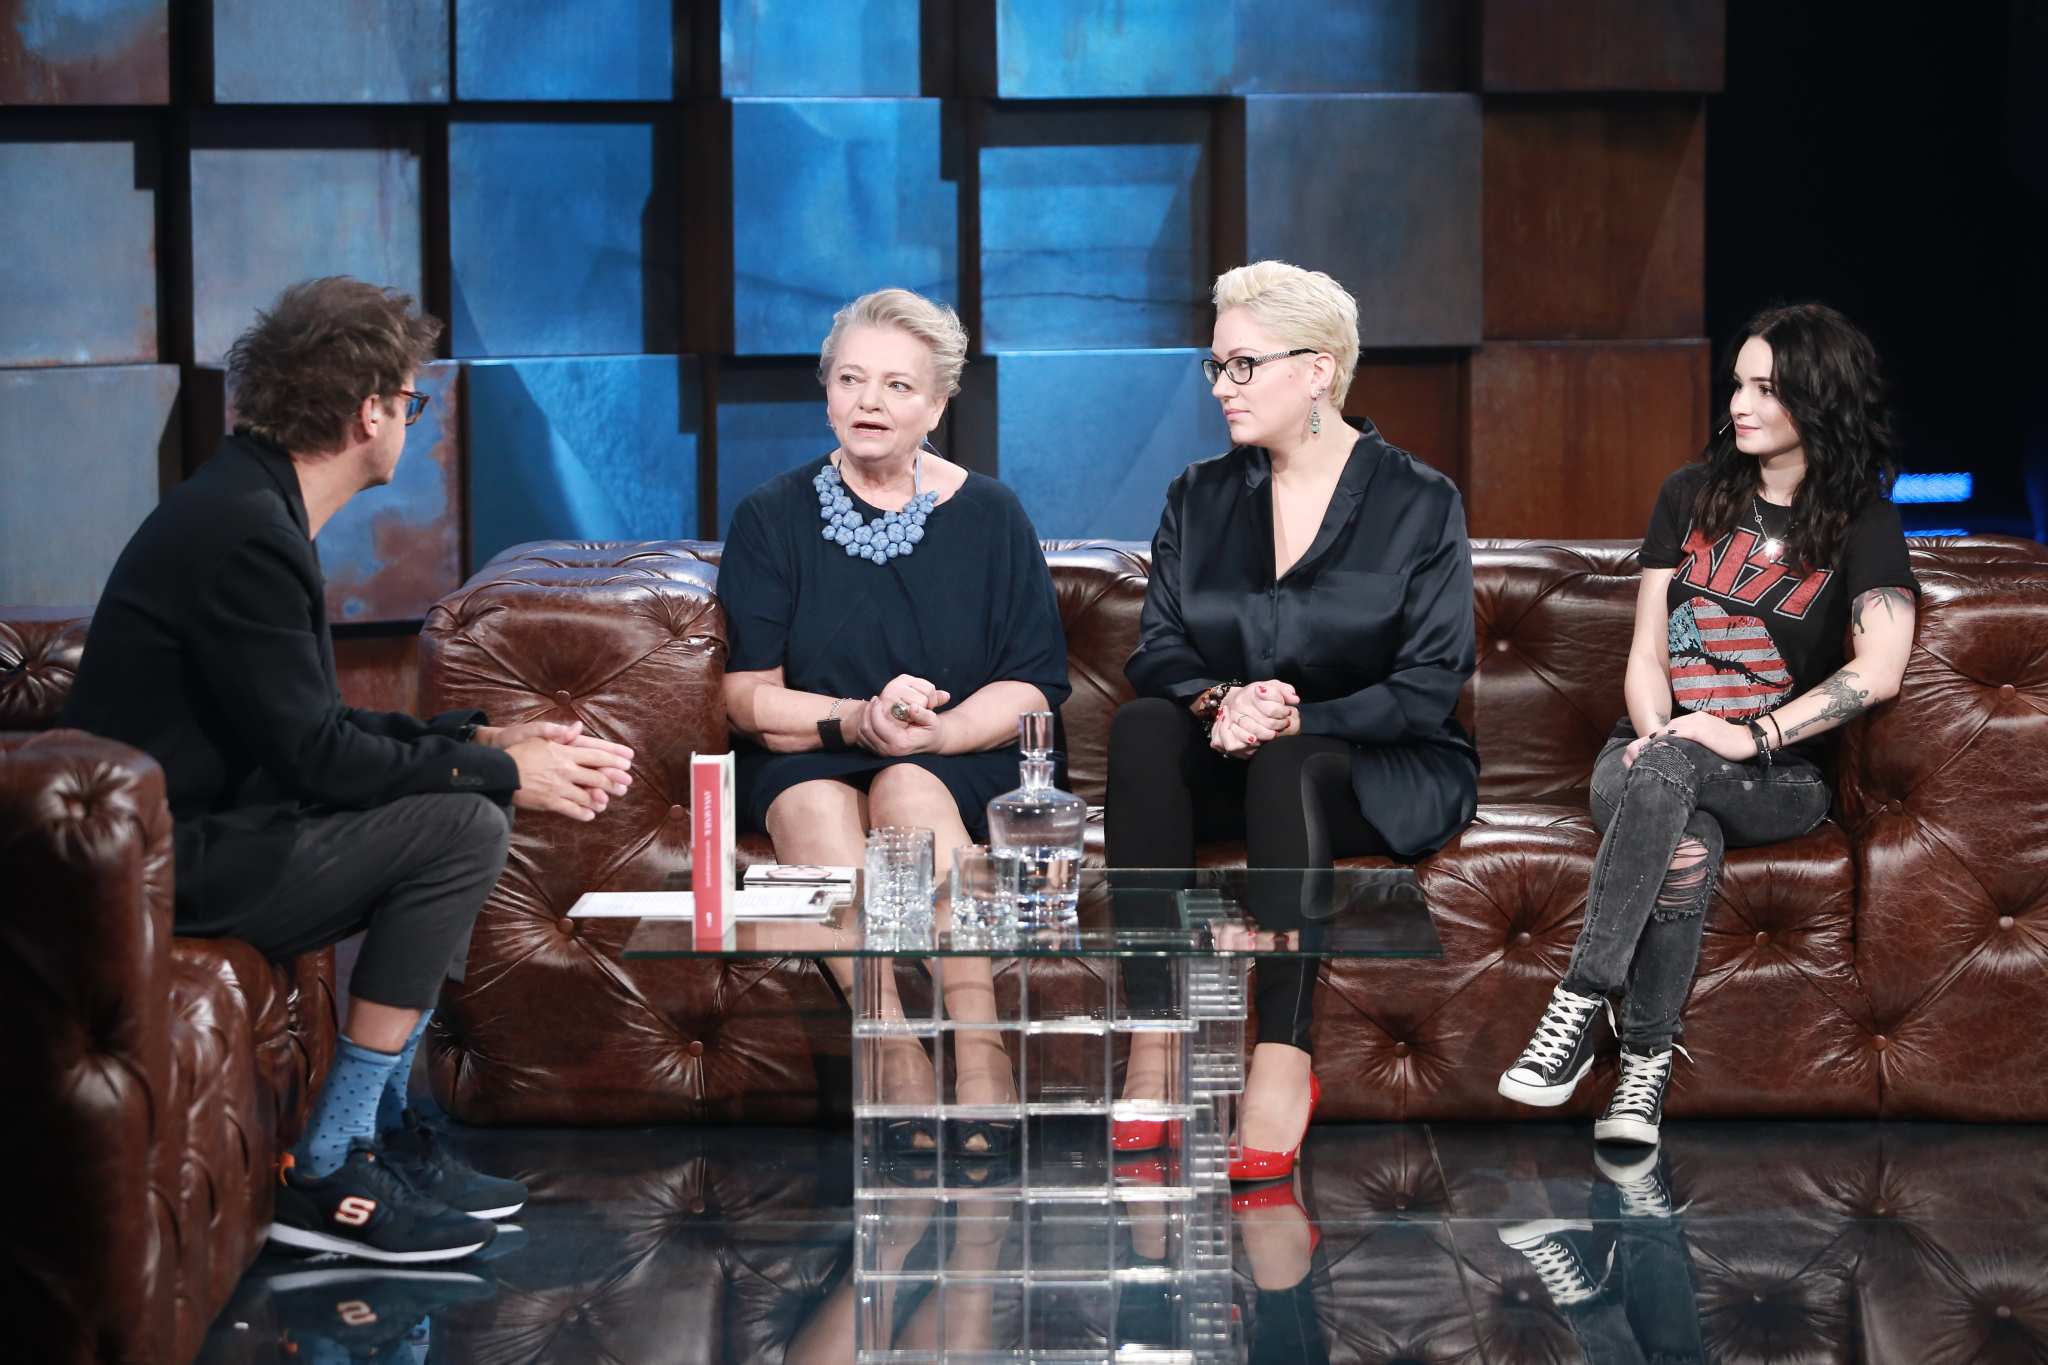 Kuba Wojewódzki, Anna Seniuk, Magdalena Małecka, Ewelina Lisowska